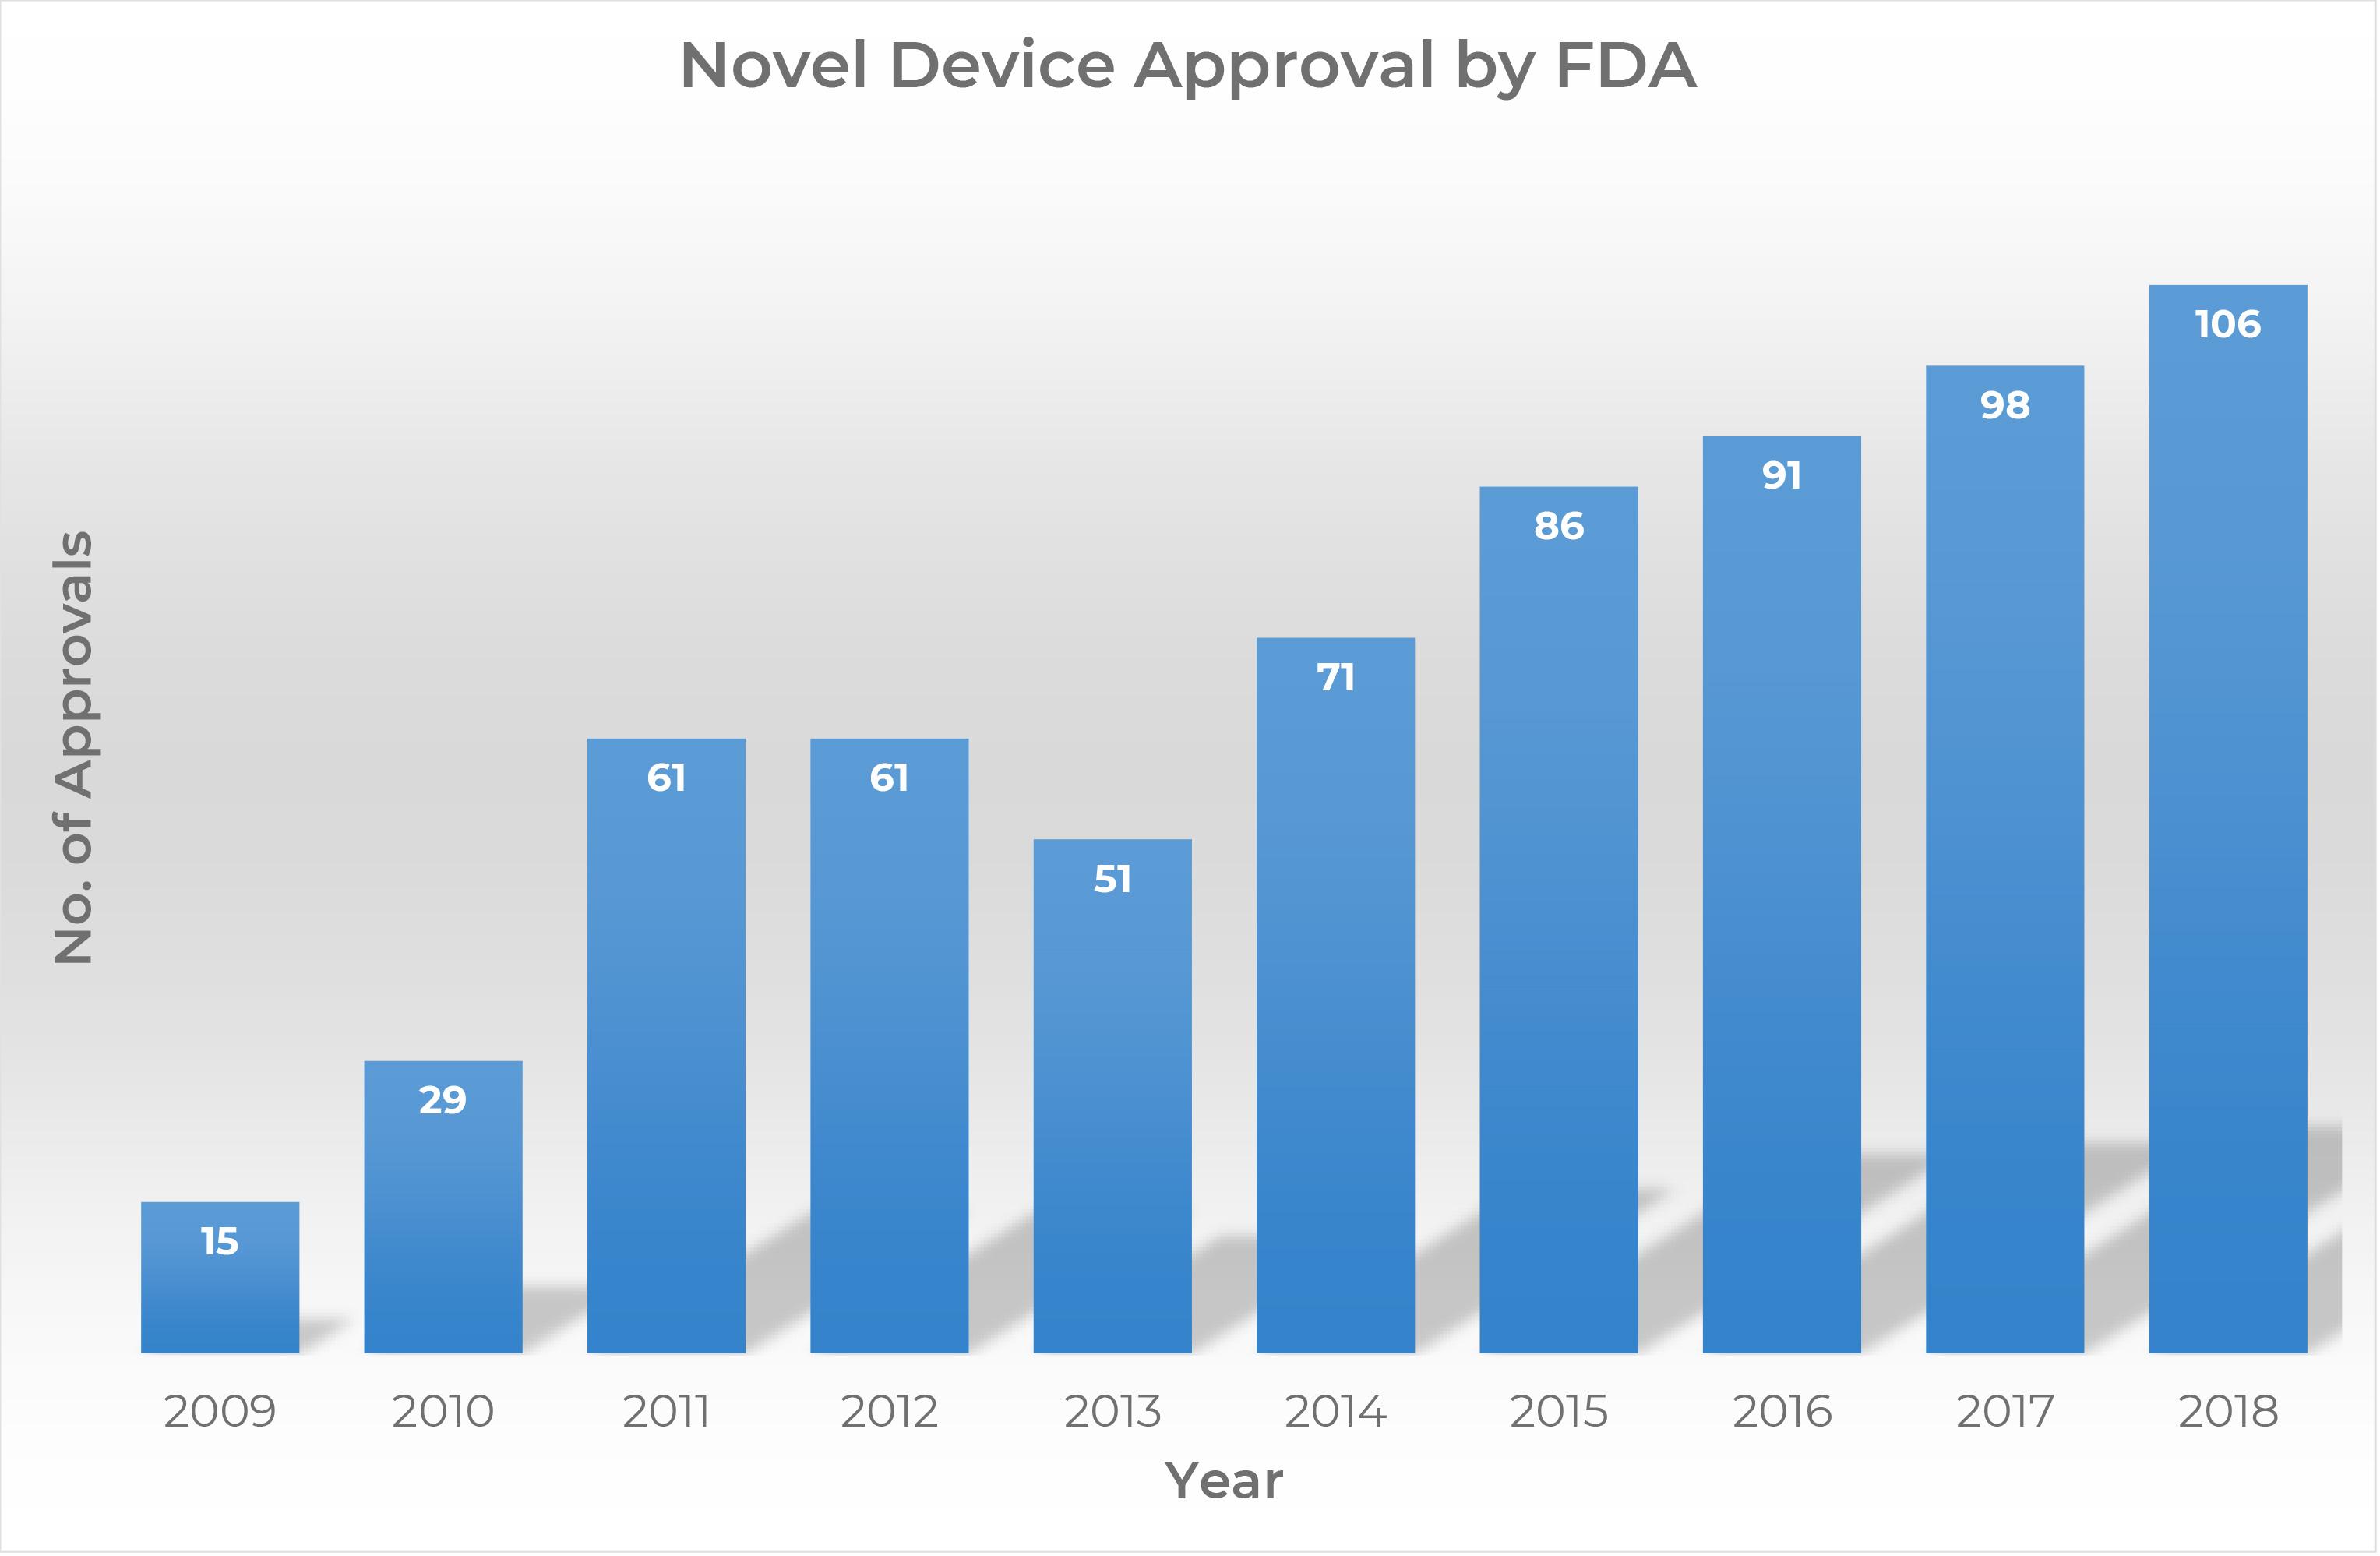 FDA novel medical device approval